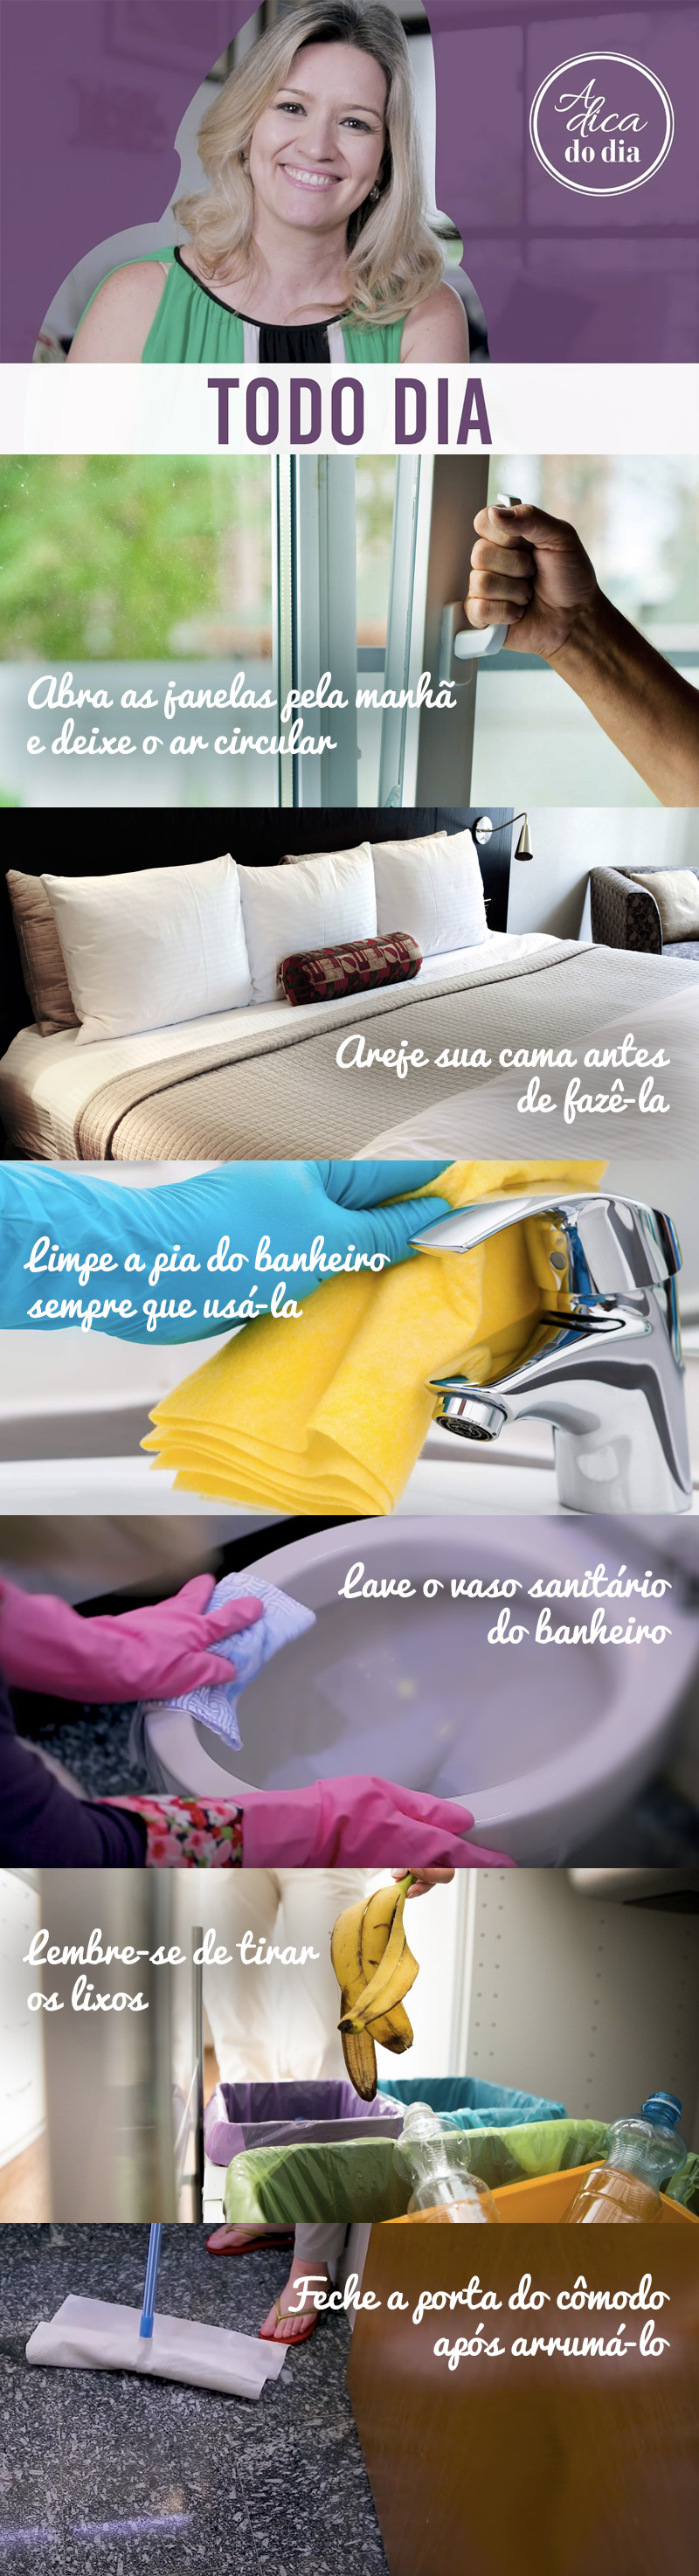 6 tarefas diarias da casa organizada flavia ferrari